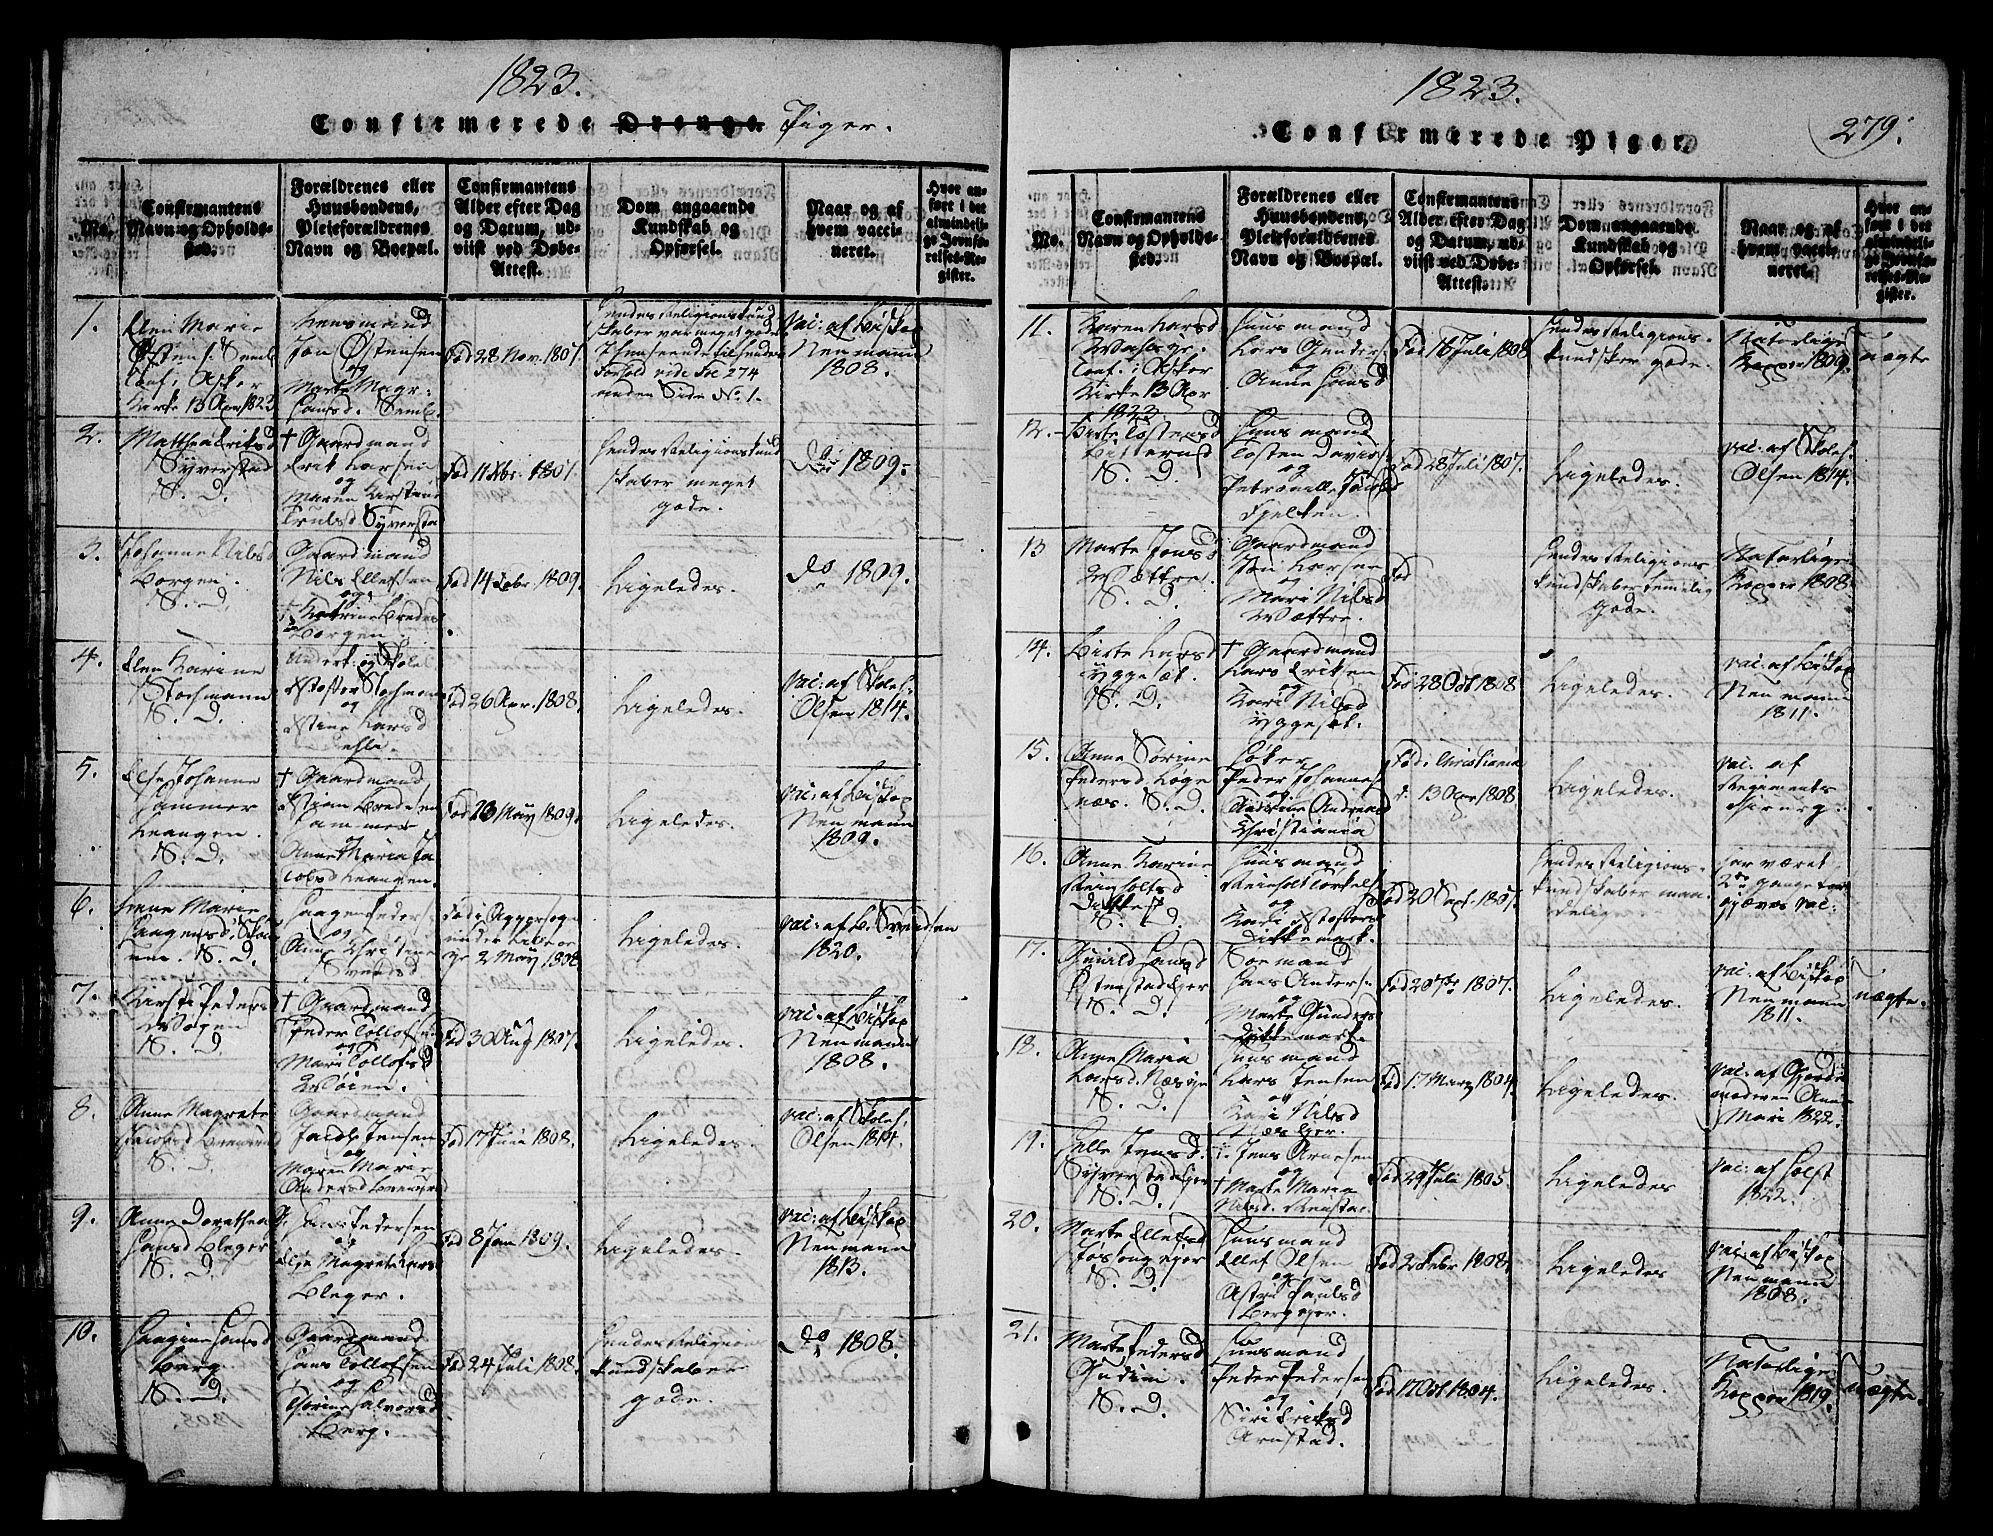 SAO, Asker prestekontor Kirkebøker, G/Ga/L0001: Klokkerbok nr. I 1, 1814-1830, s. 279